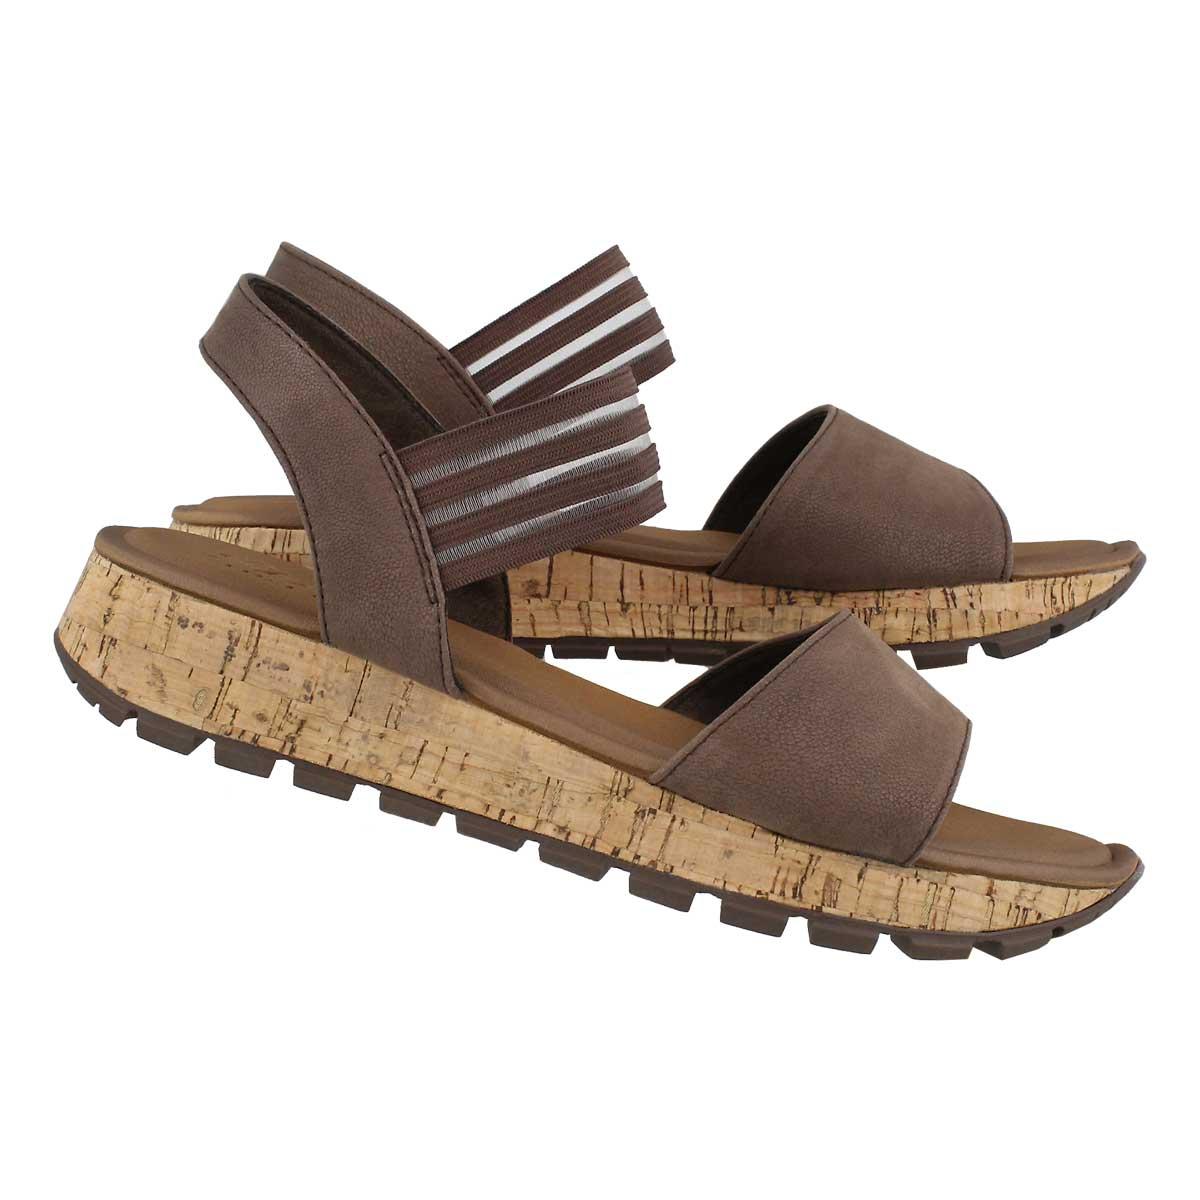 Lds Footstep Markers brn wedge sandal